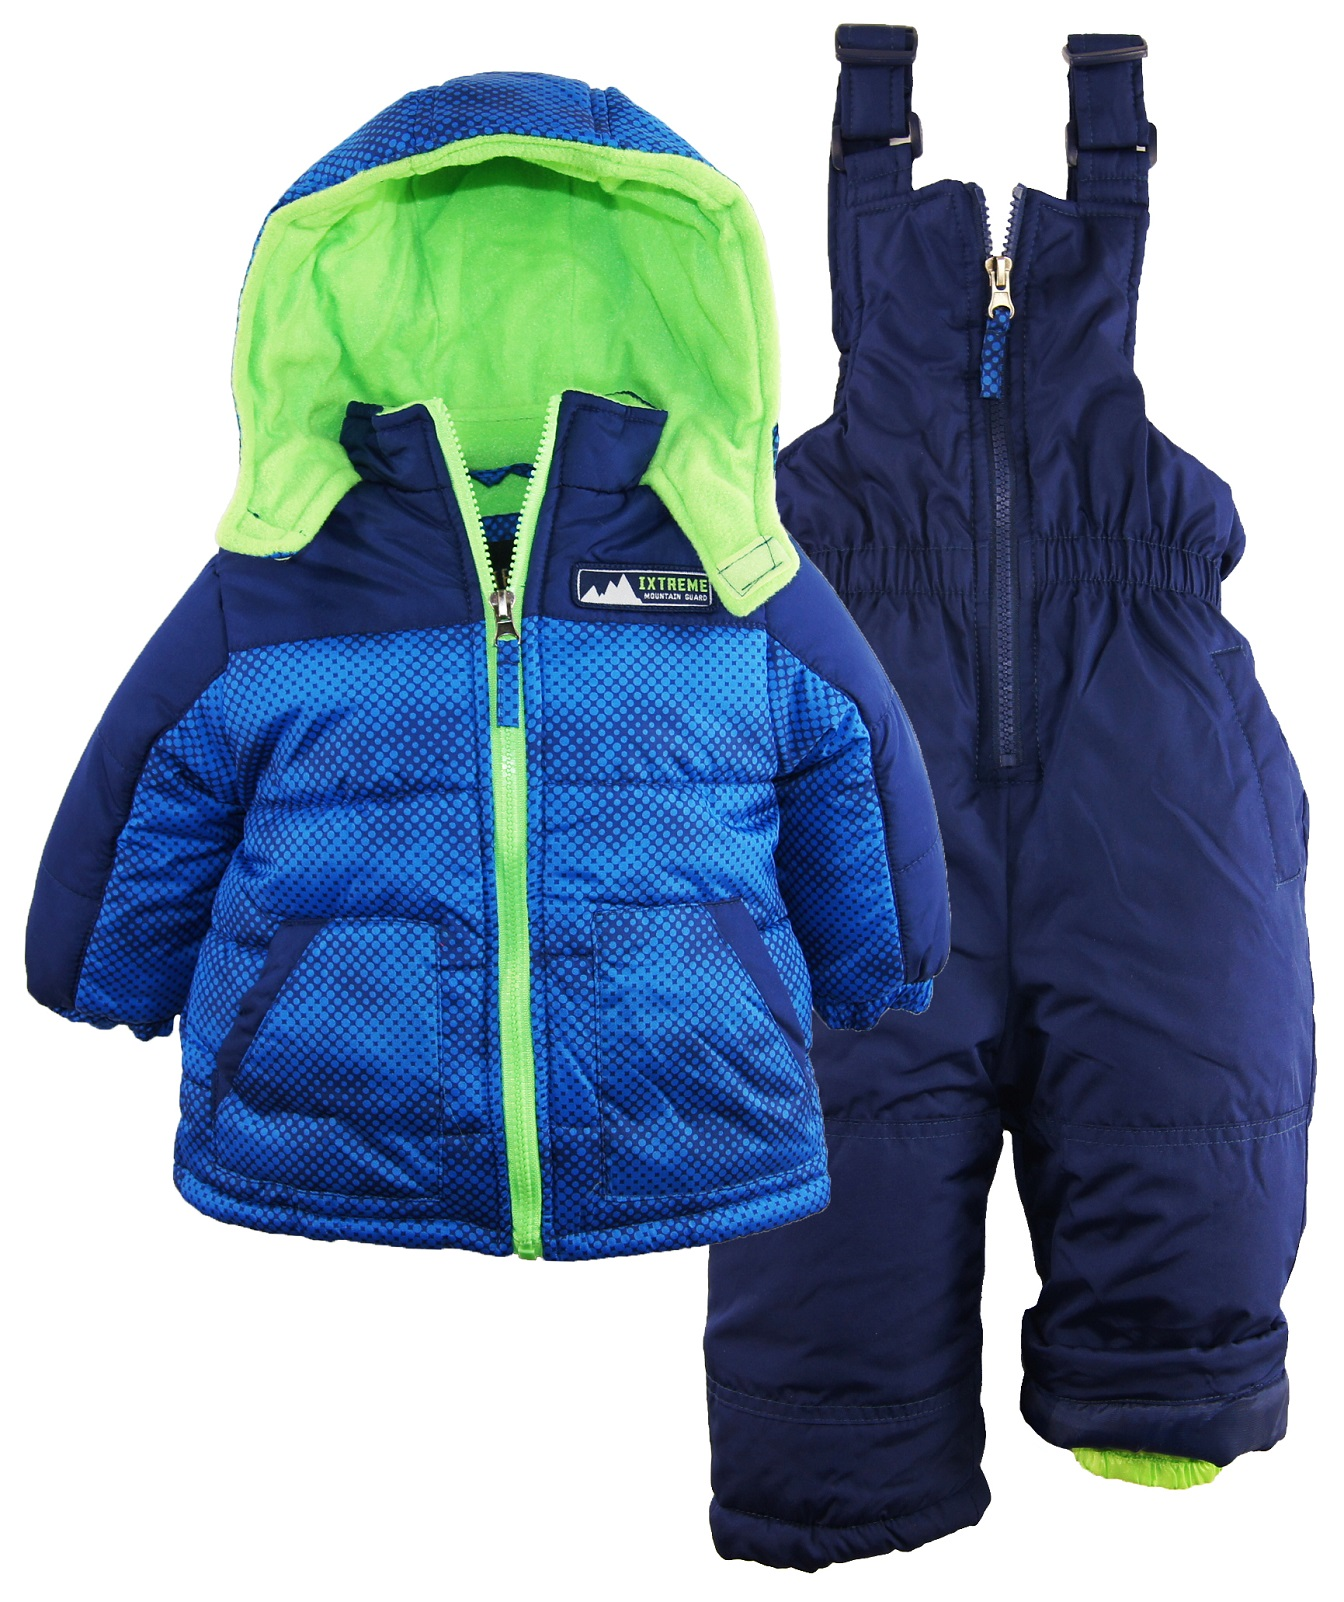 2ec3704b24 iXtreme Baby Boys  Colorblock Two Piece Snowsuit Puffer Jacket Ski Bib Pant  Set